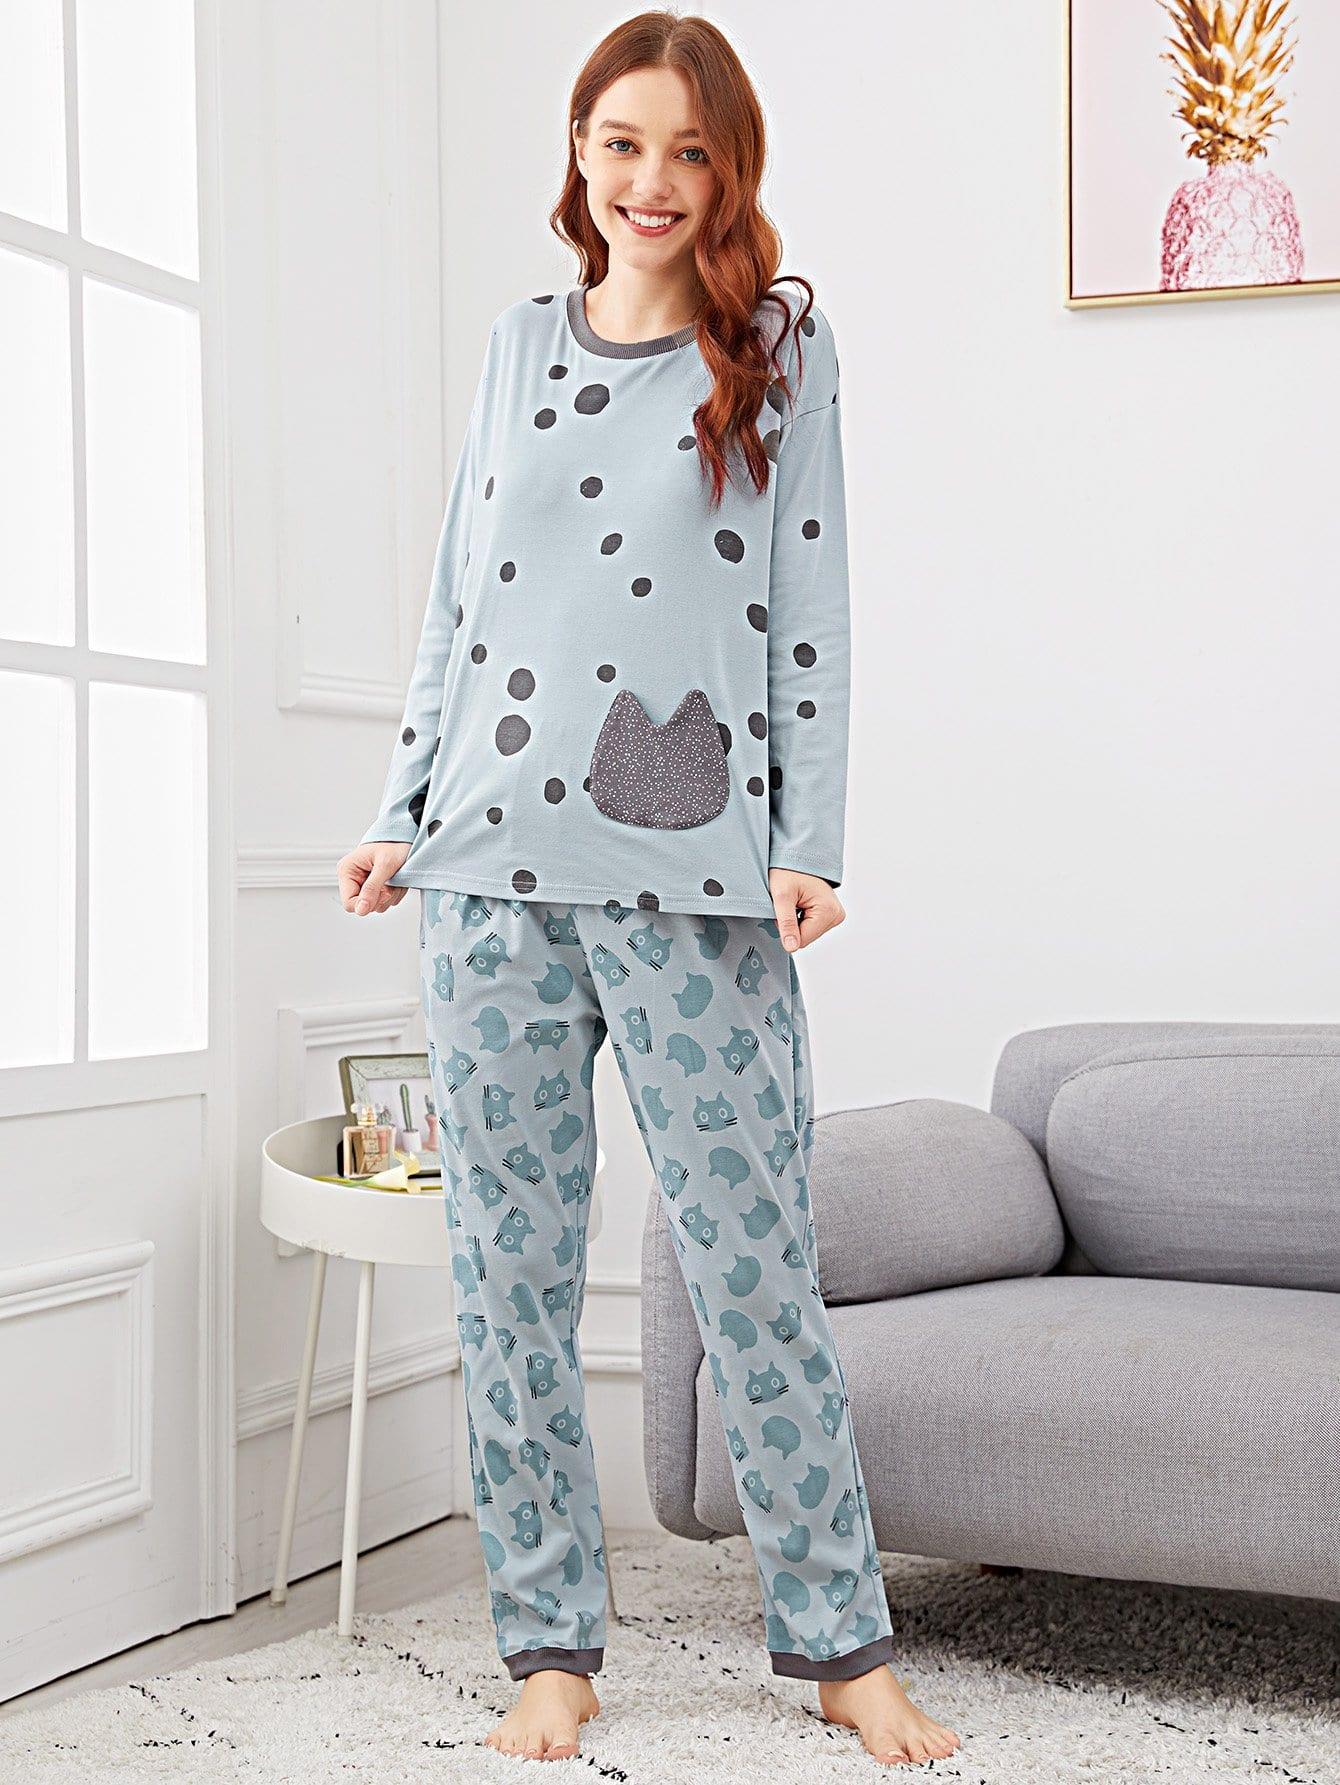 Фото - Пижама в горошек с принтом кота от SheIn цвет синие